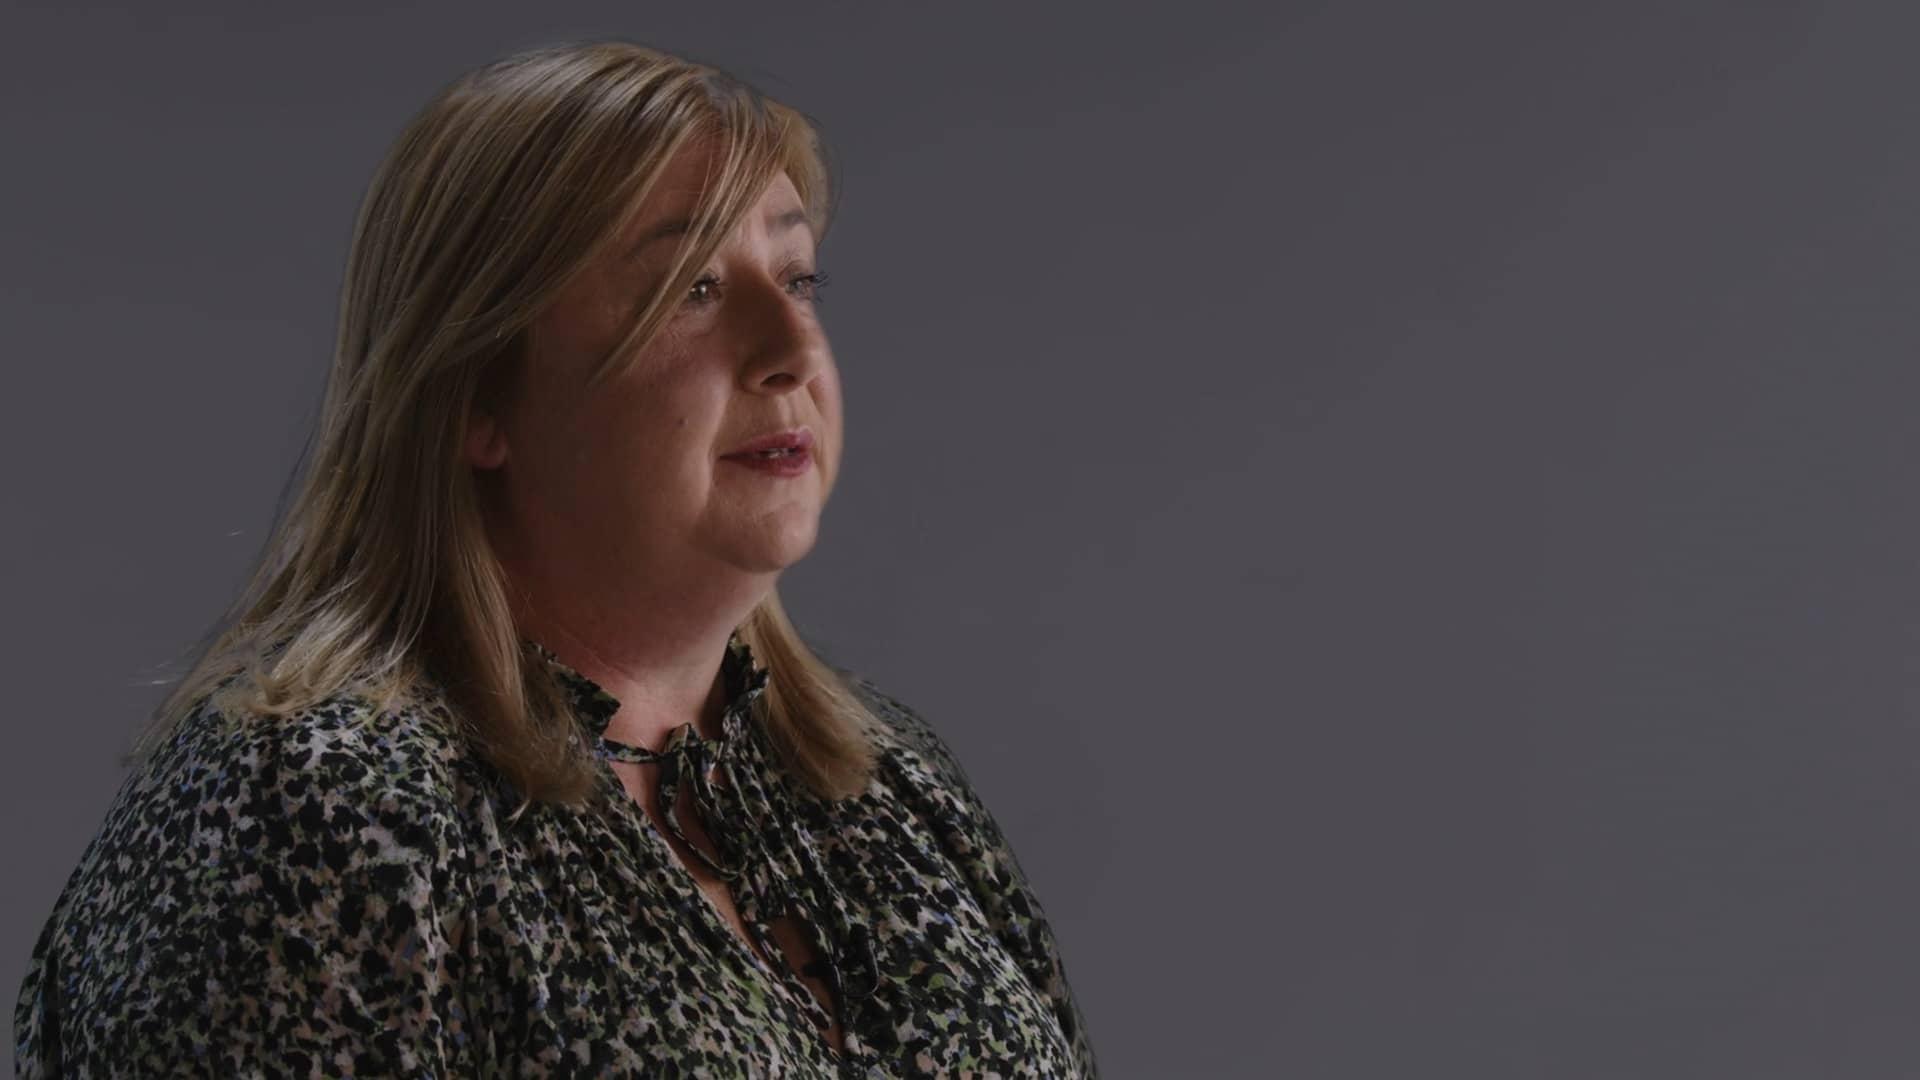 Oyster Chief Financial Officer, Rachel Barr